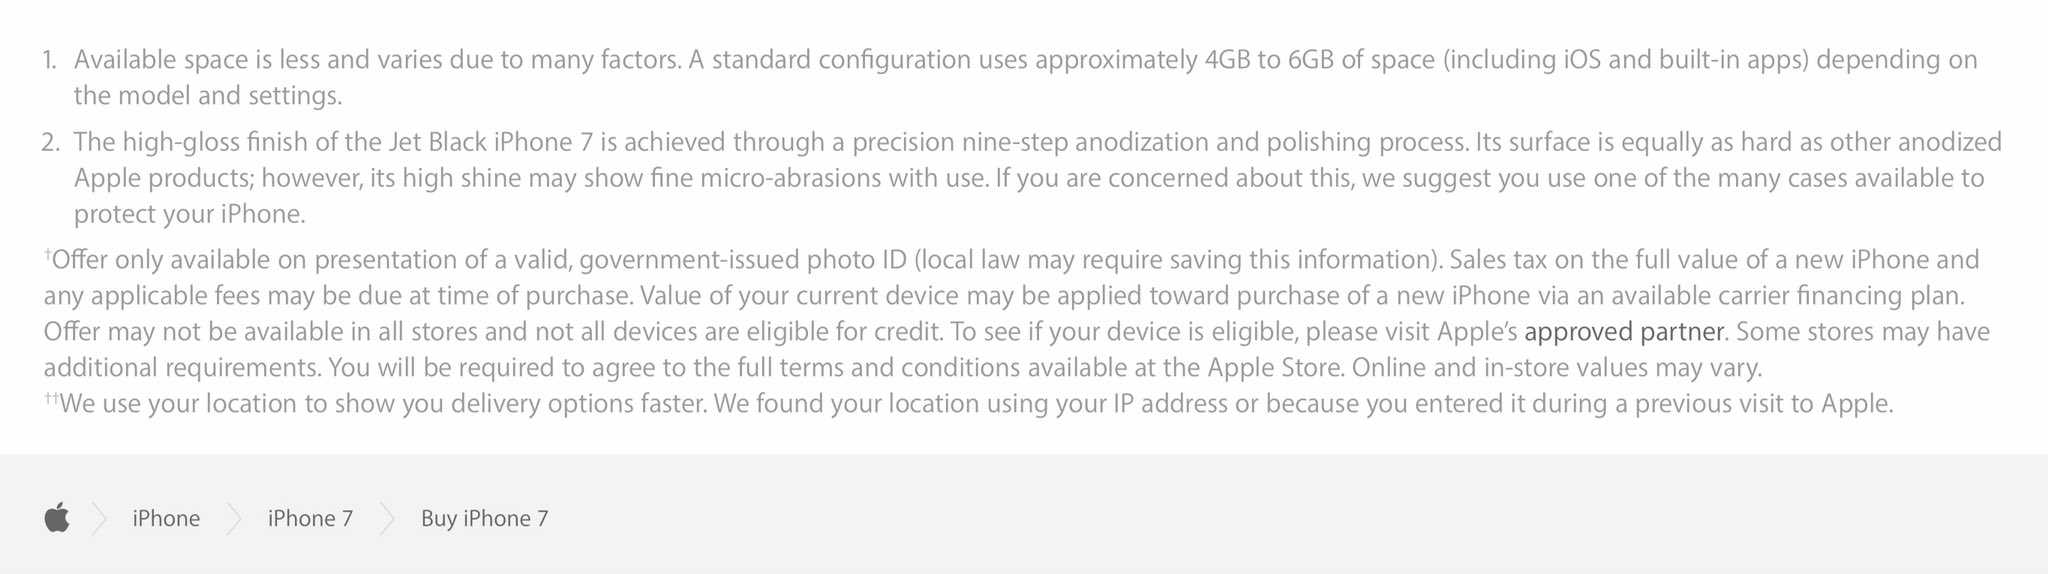 iphone 7 details